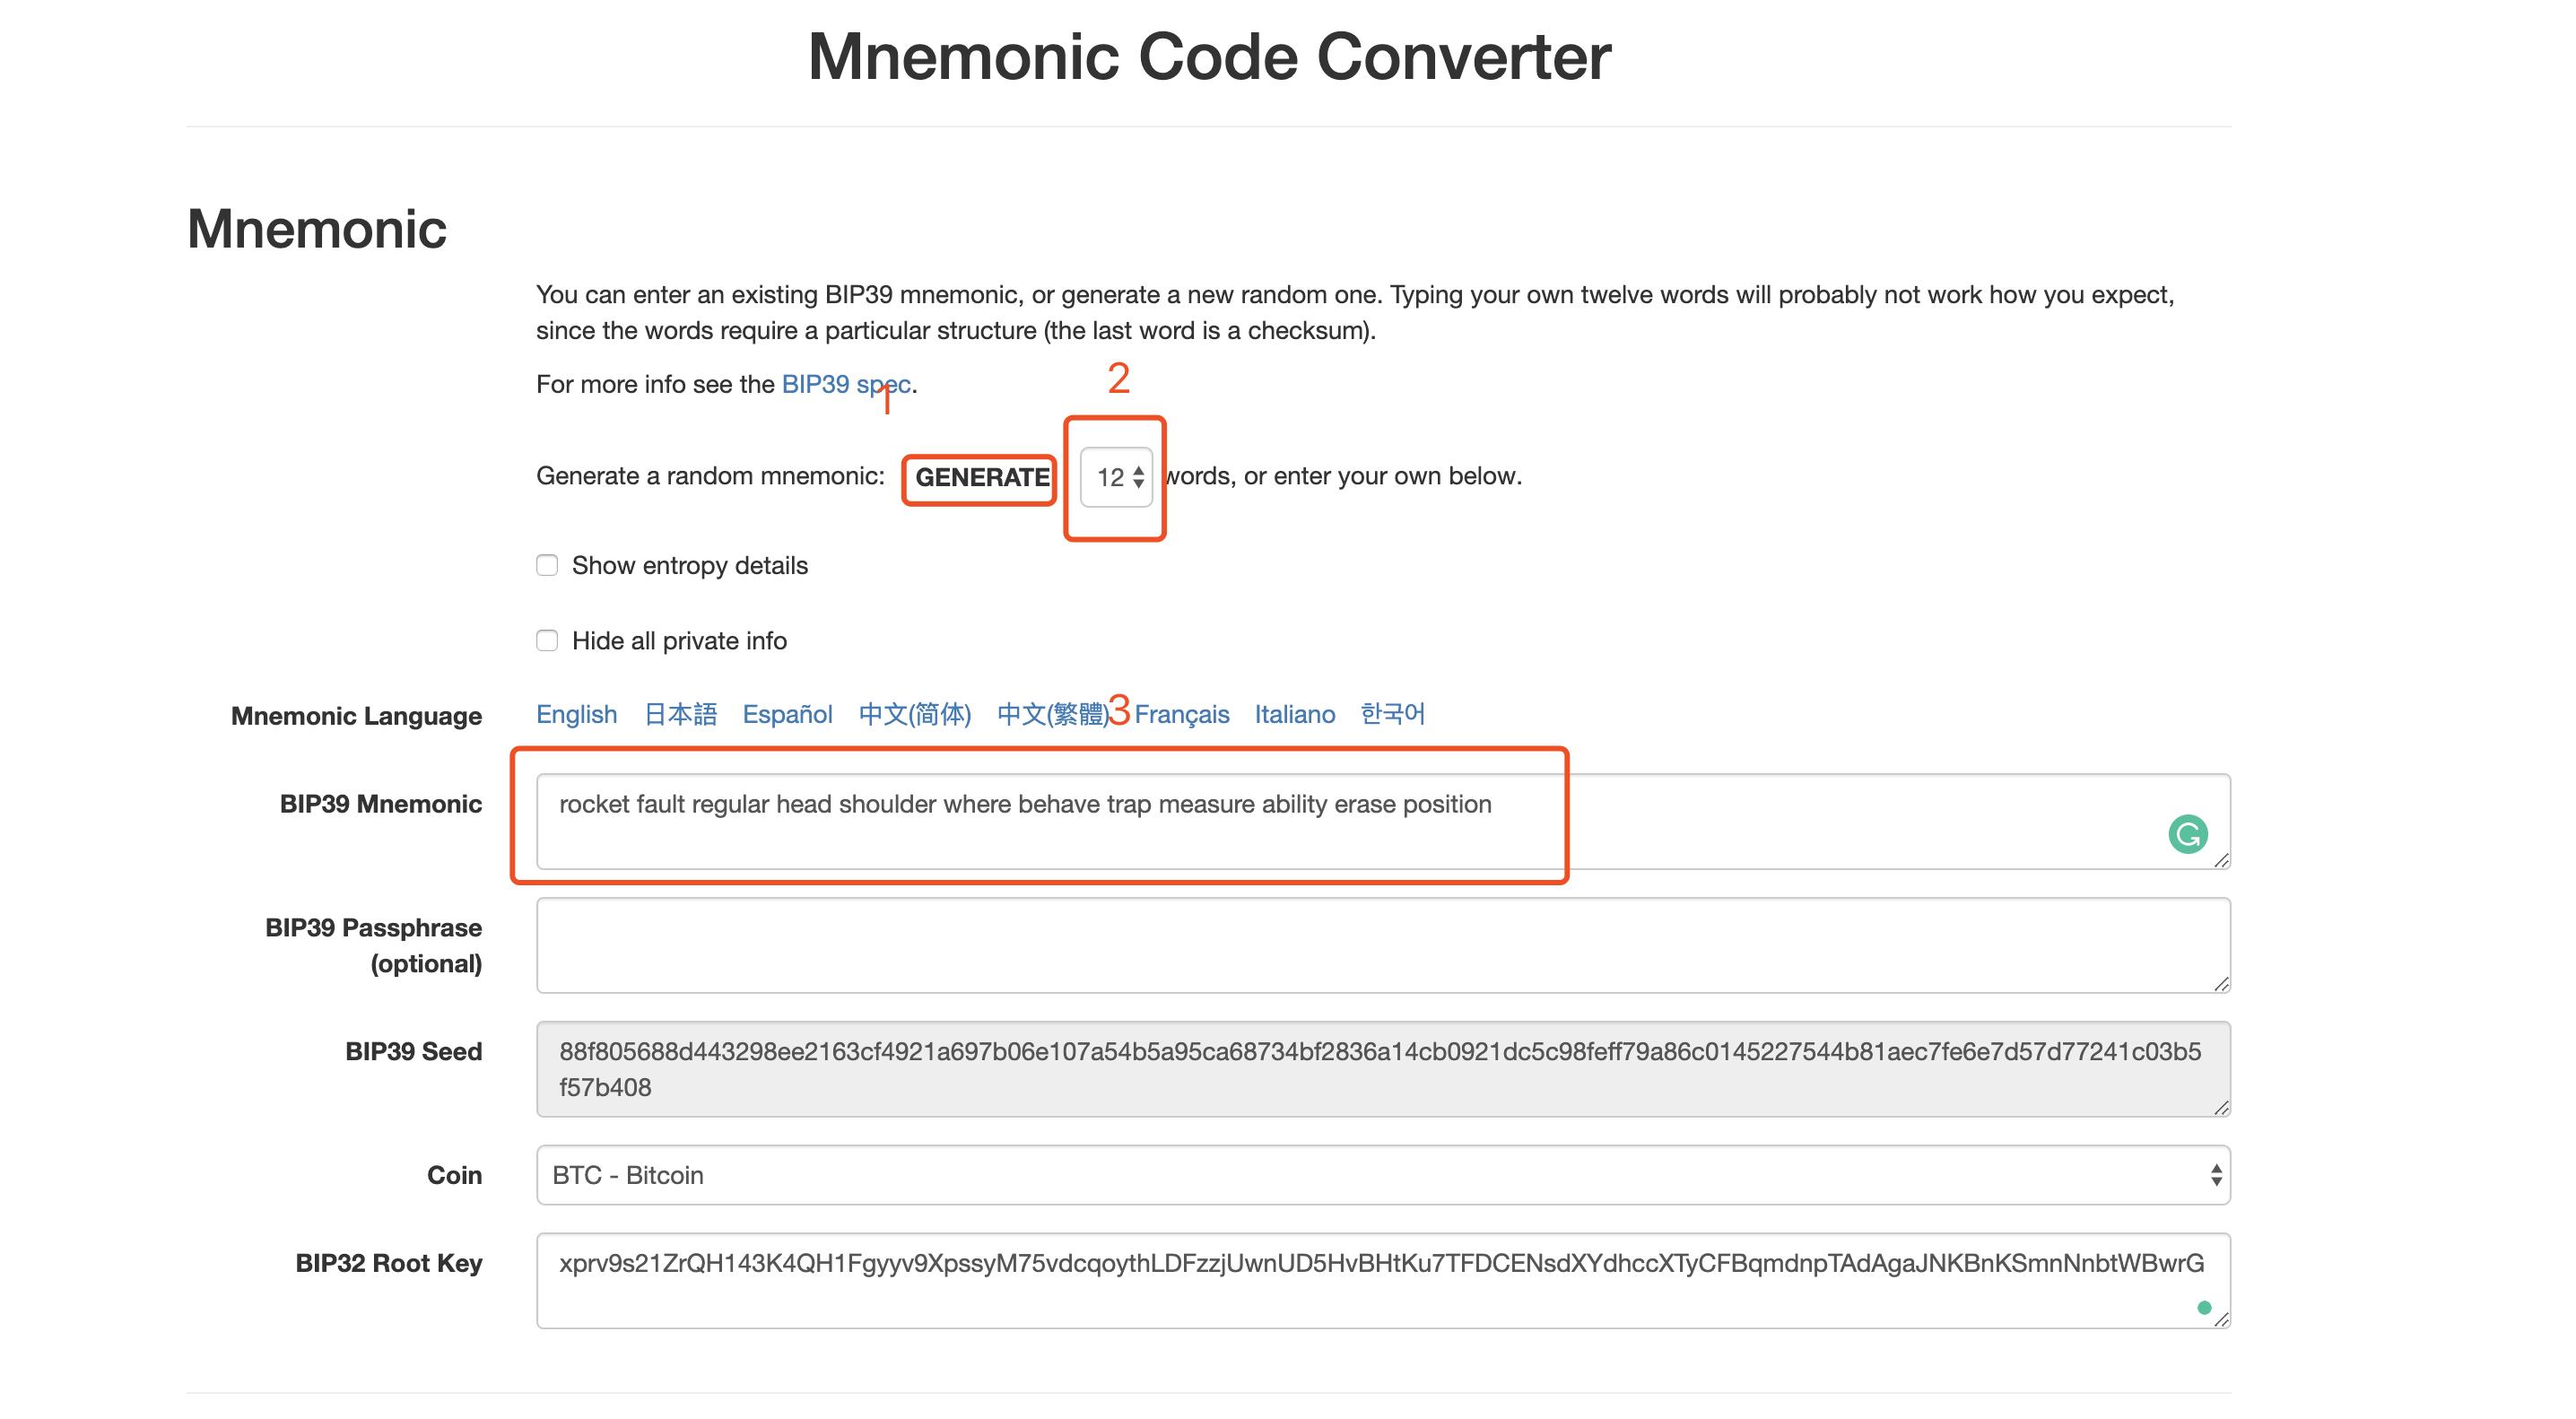 Mnemonic converter